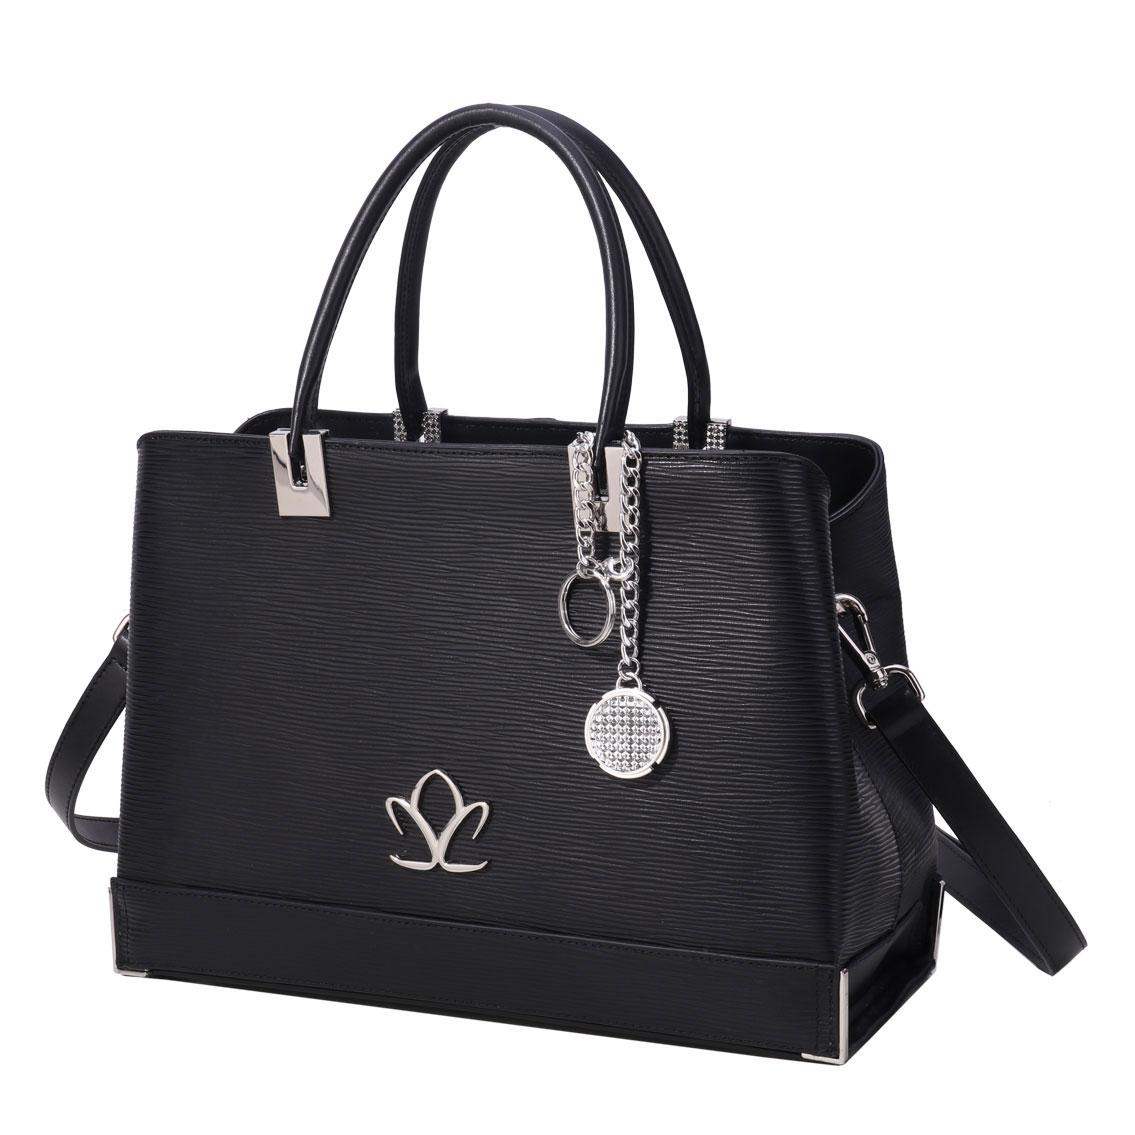 Cashs Ireland, Top Grain Leather Aileen Black Handbag with Atlantic Way Crystal Charm